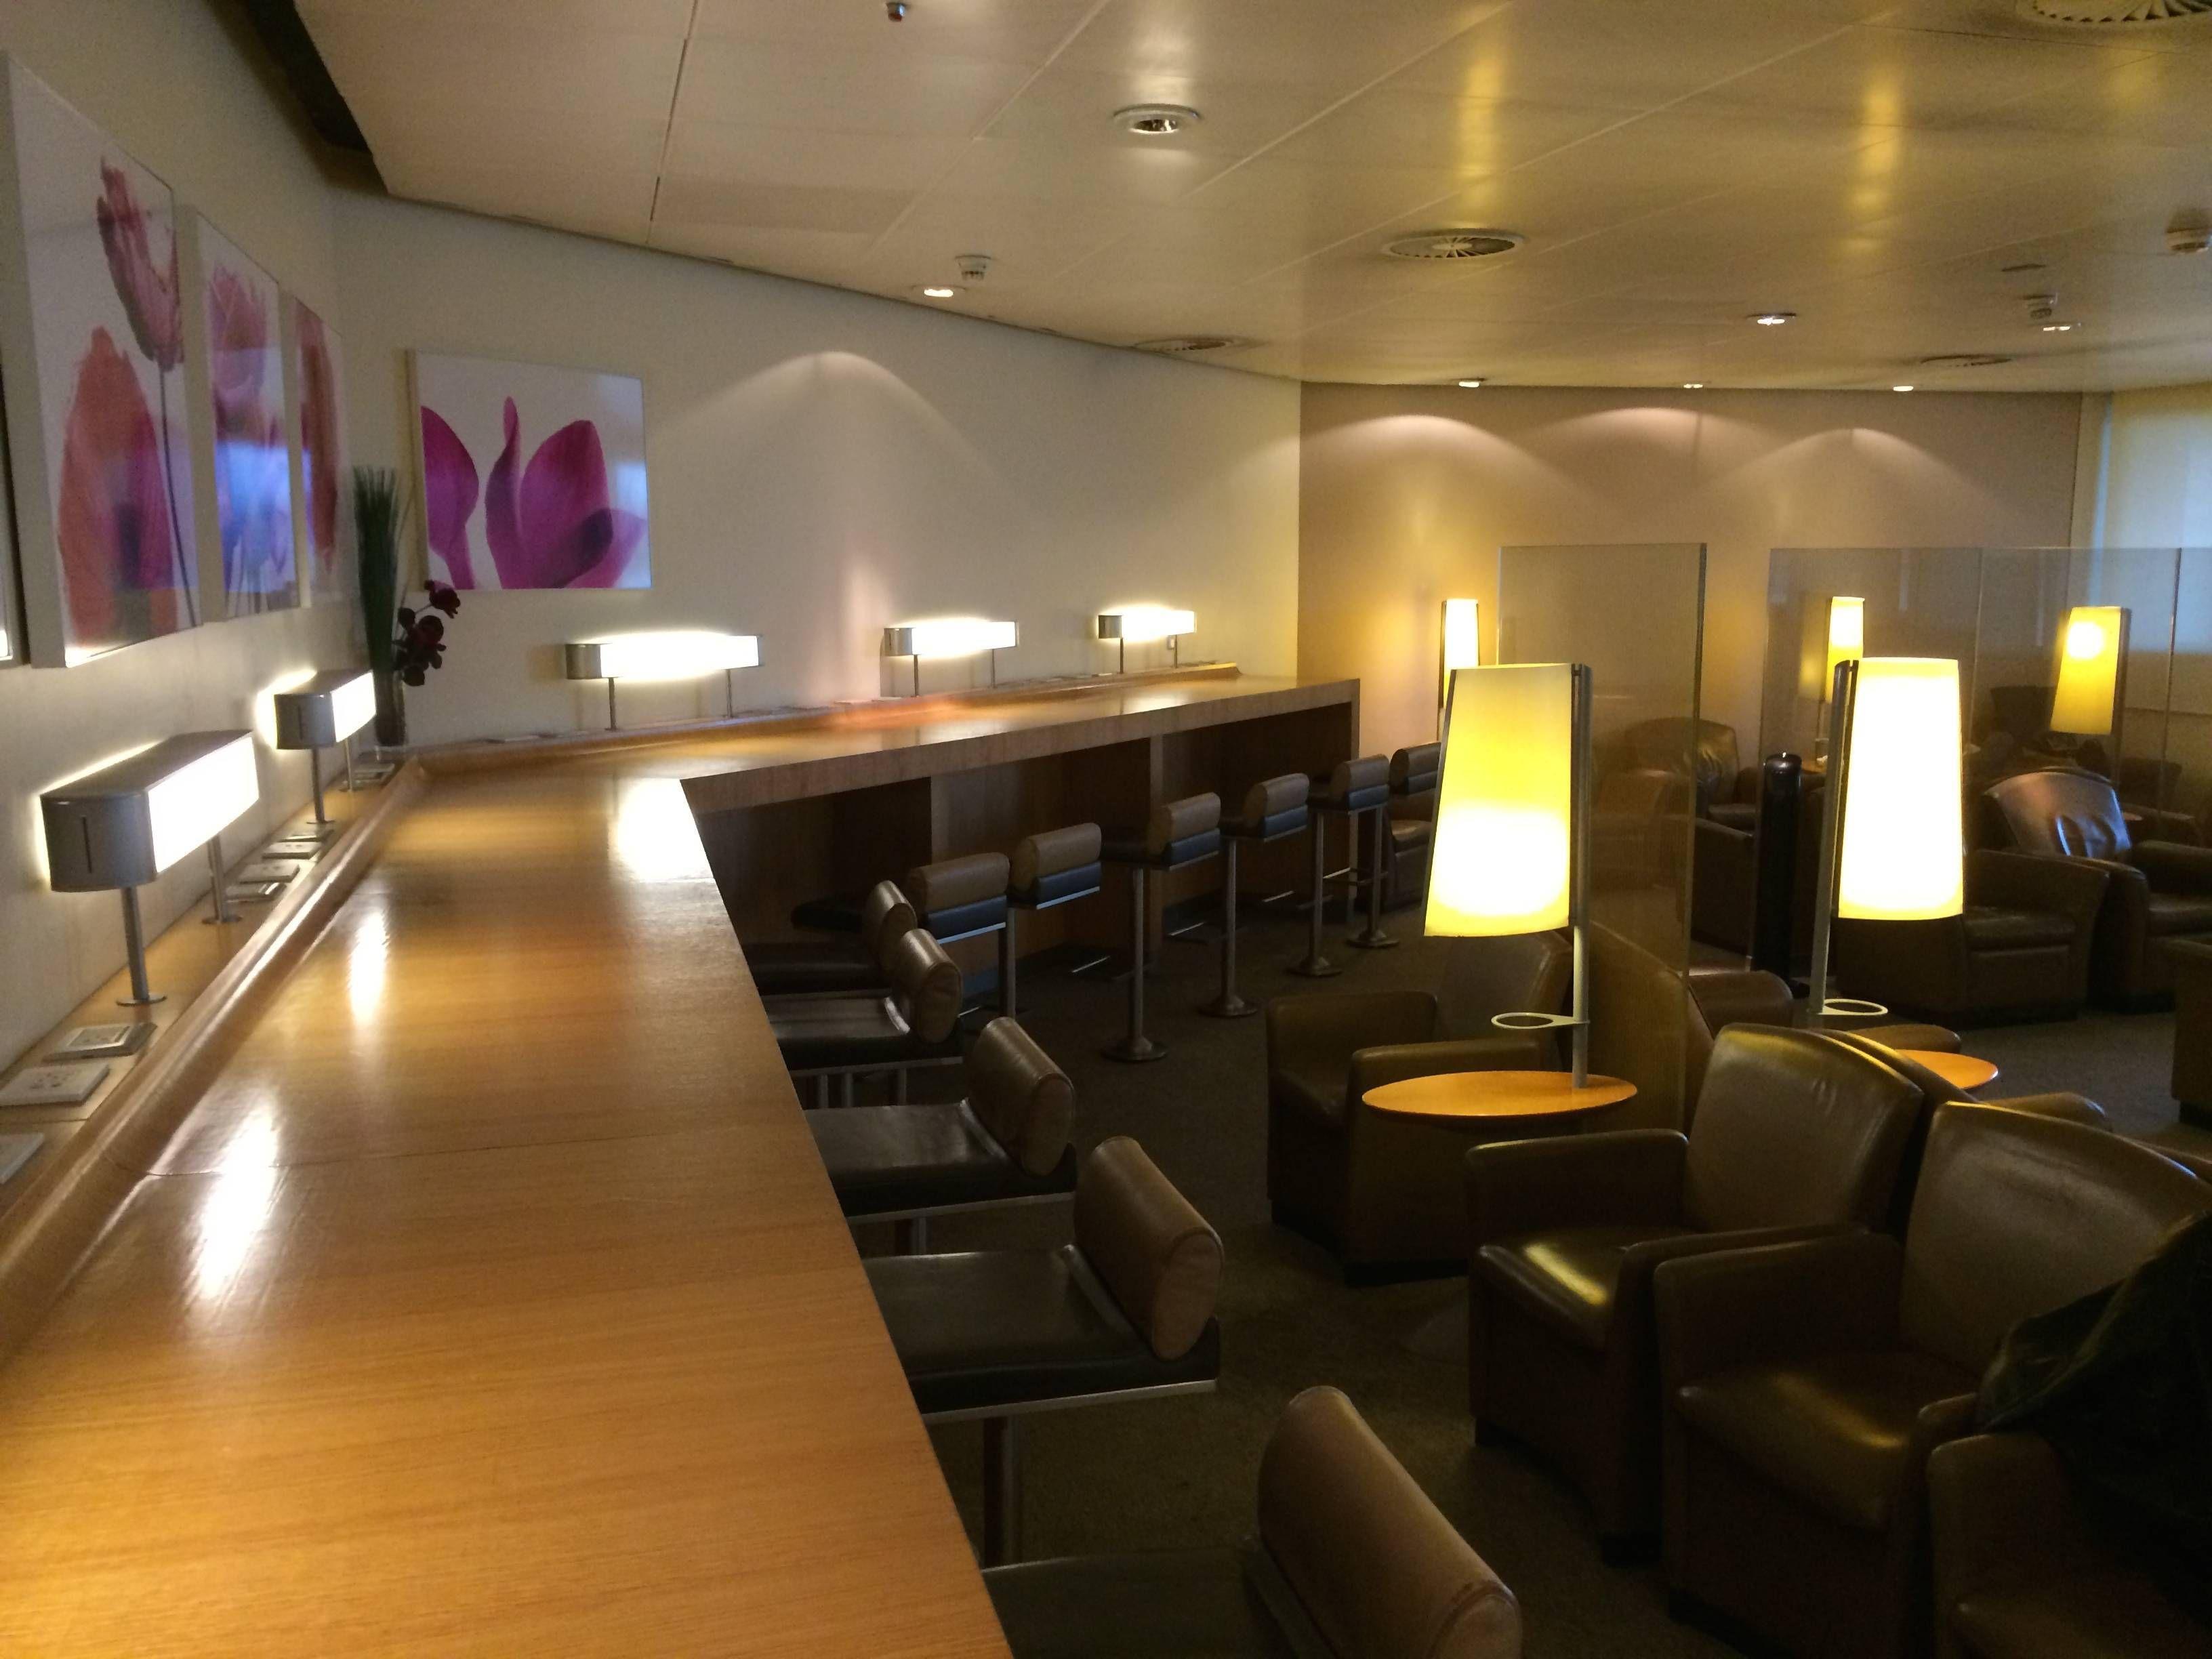 sala vip airfrance klm no aeroporto de guarulhos. Black Bedroom Furniture Sets. Home Design Ideas